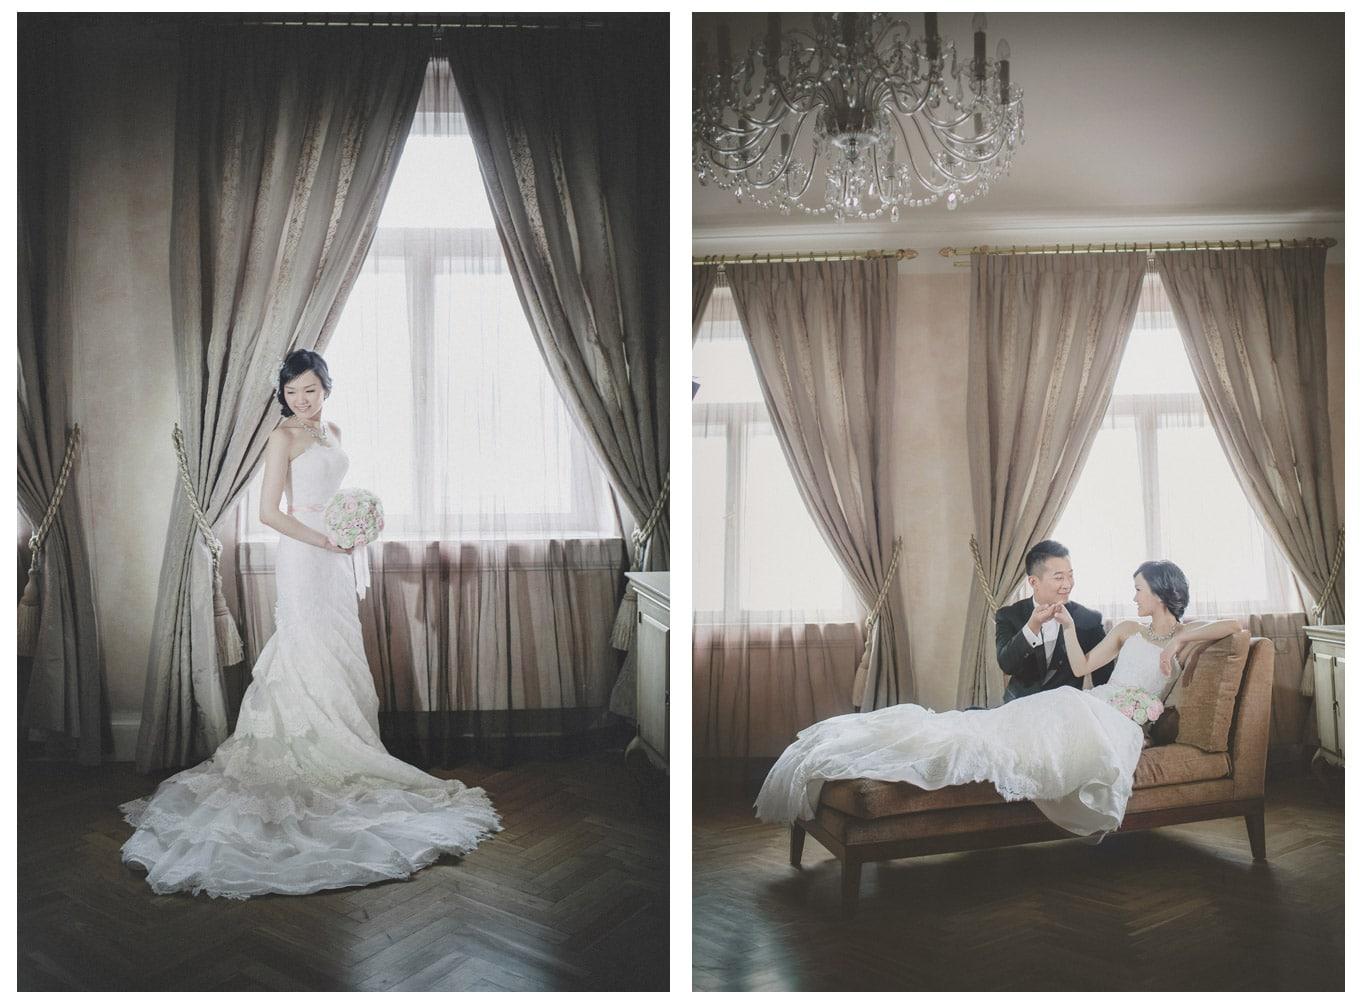 Prague pre wedding / Suki & Steven / portraits at the Pachtuv Palace